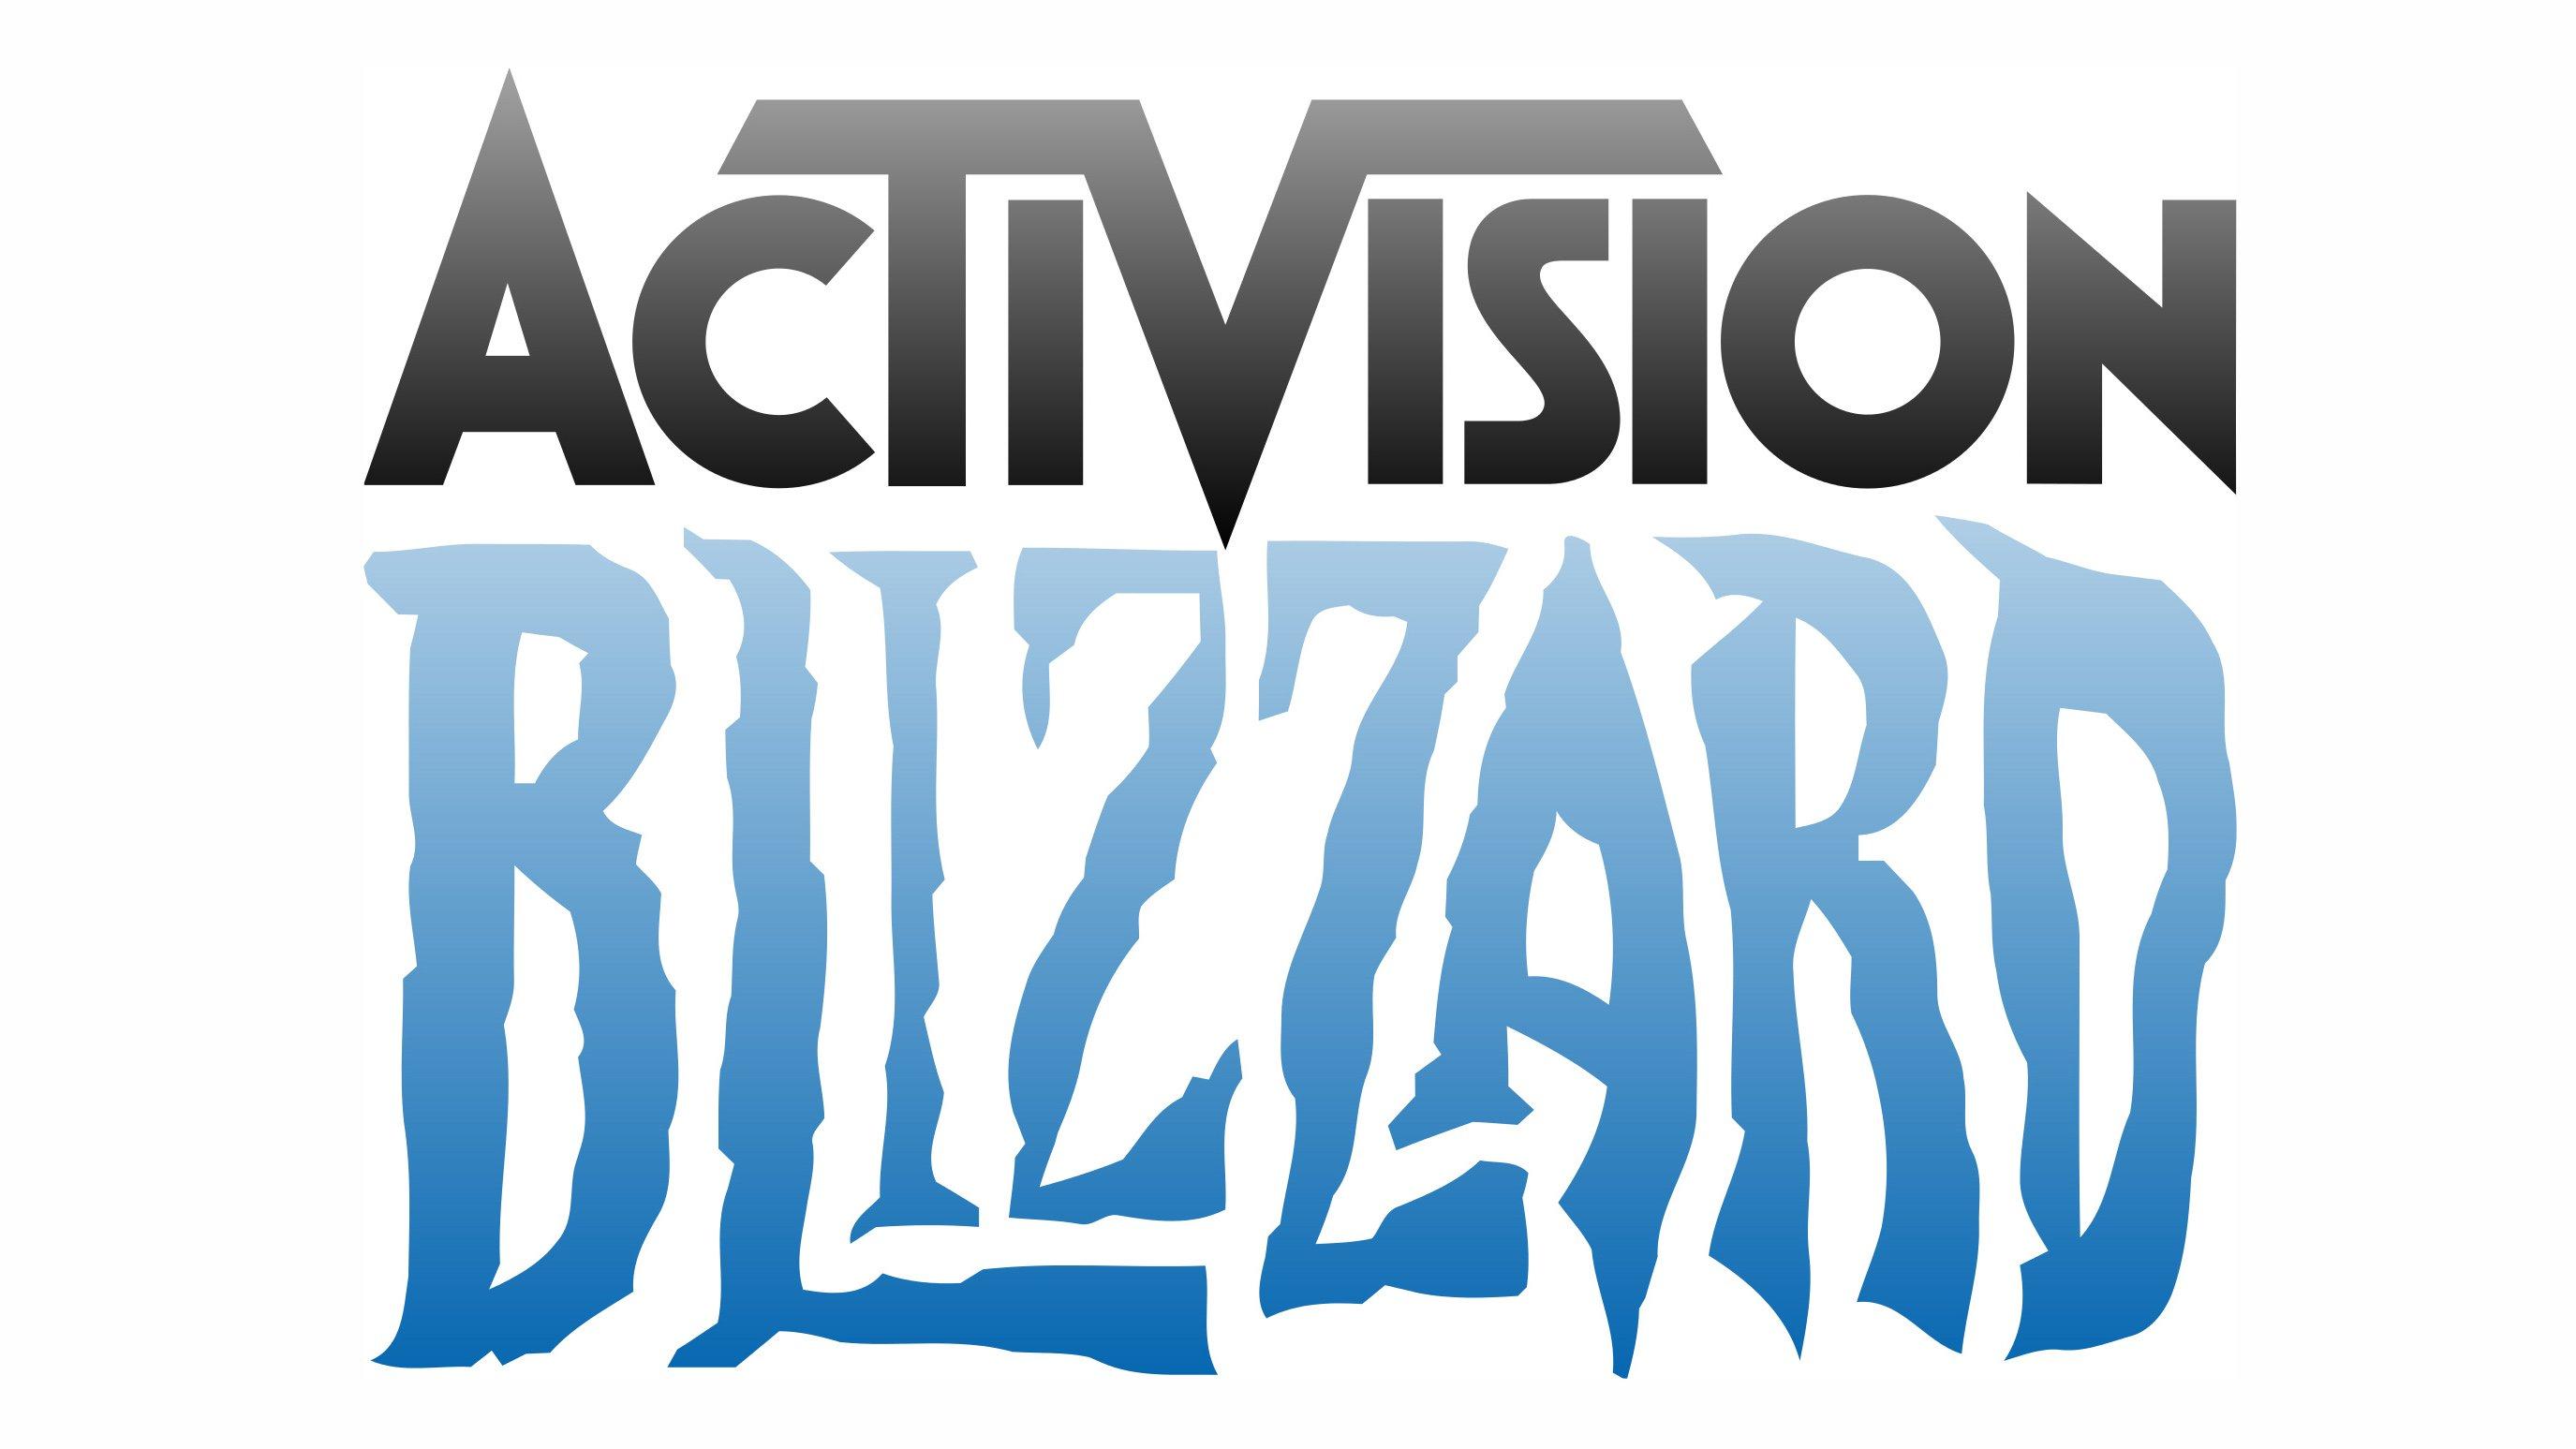 Activisoin Blizzard Logo